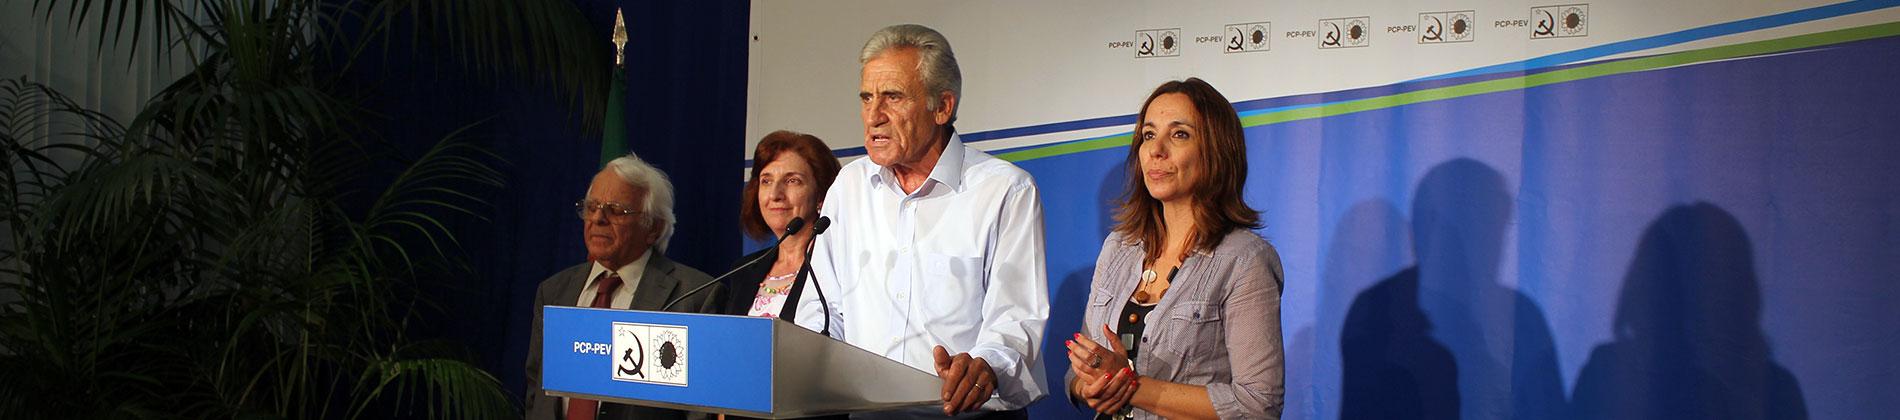 20151004_destaque_declaracao_resultados_eleitorais